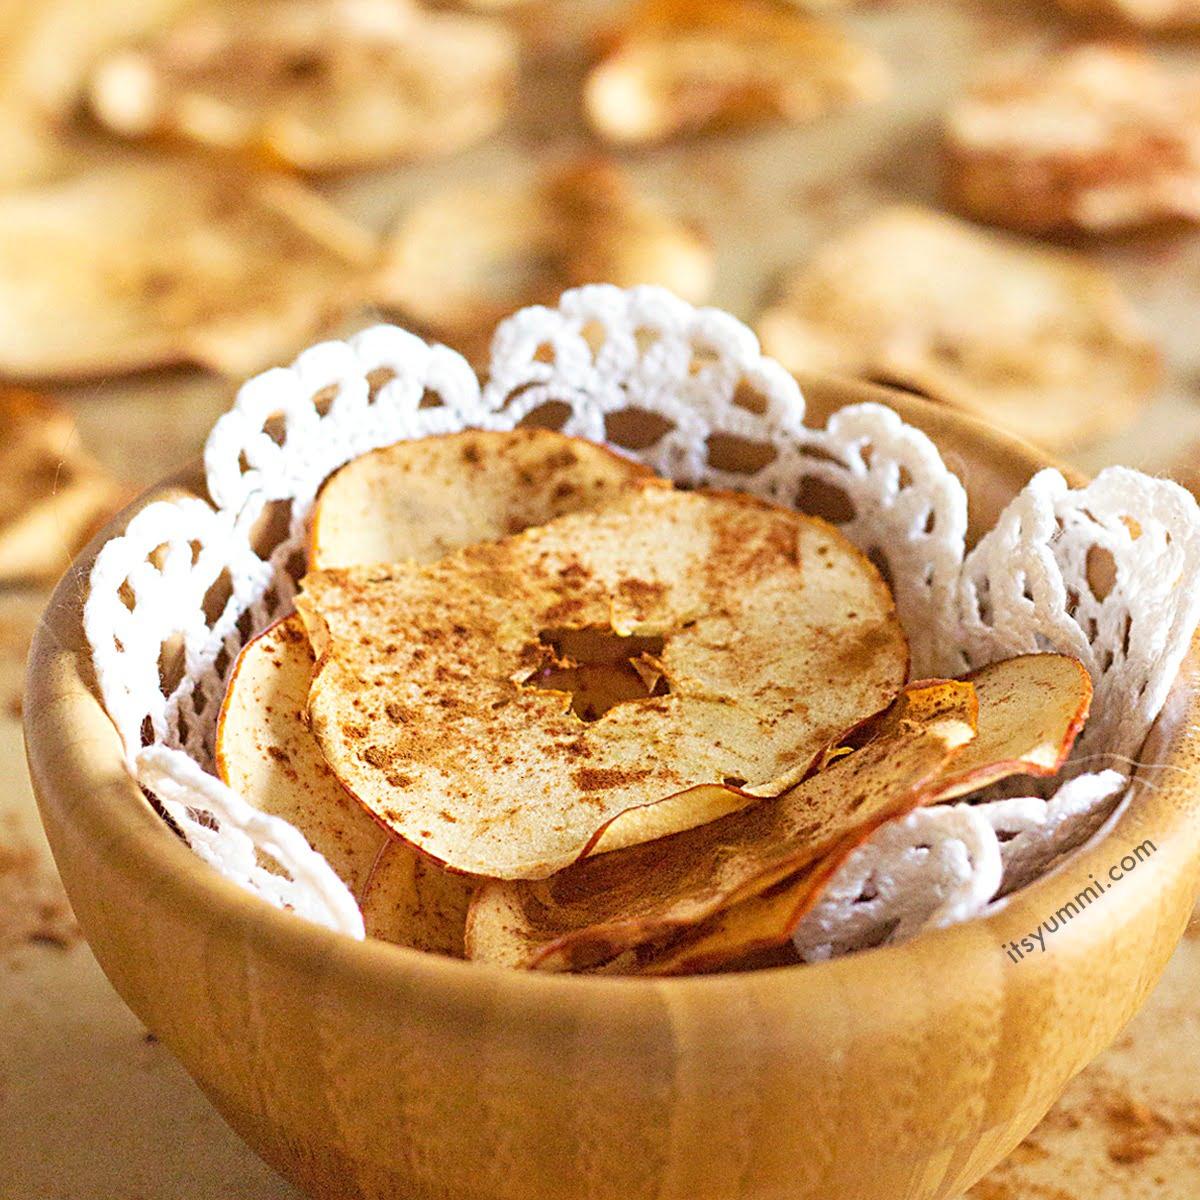 Cinnamon Baked Apple Chips Recipe ⋆ Its Yummi